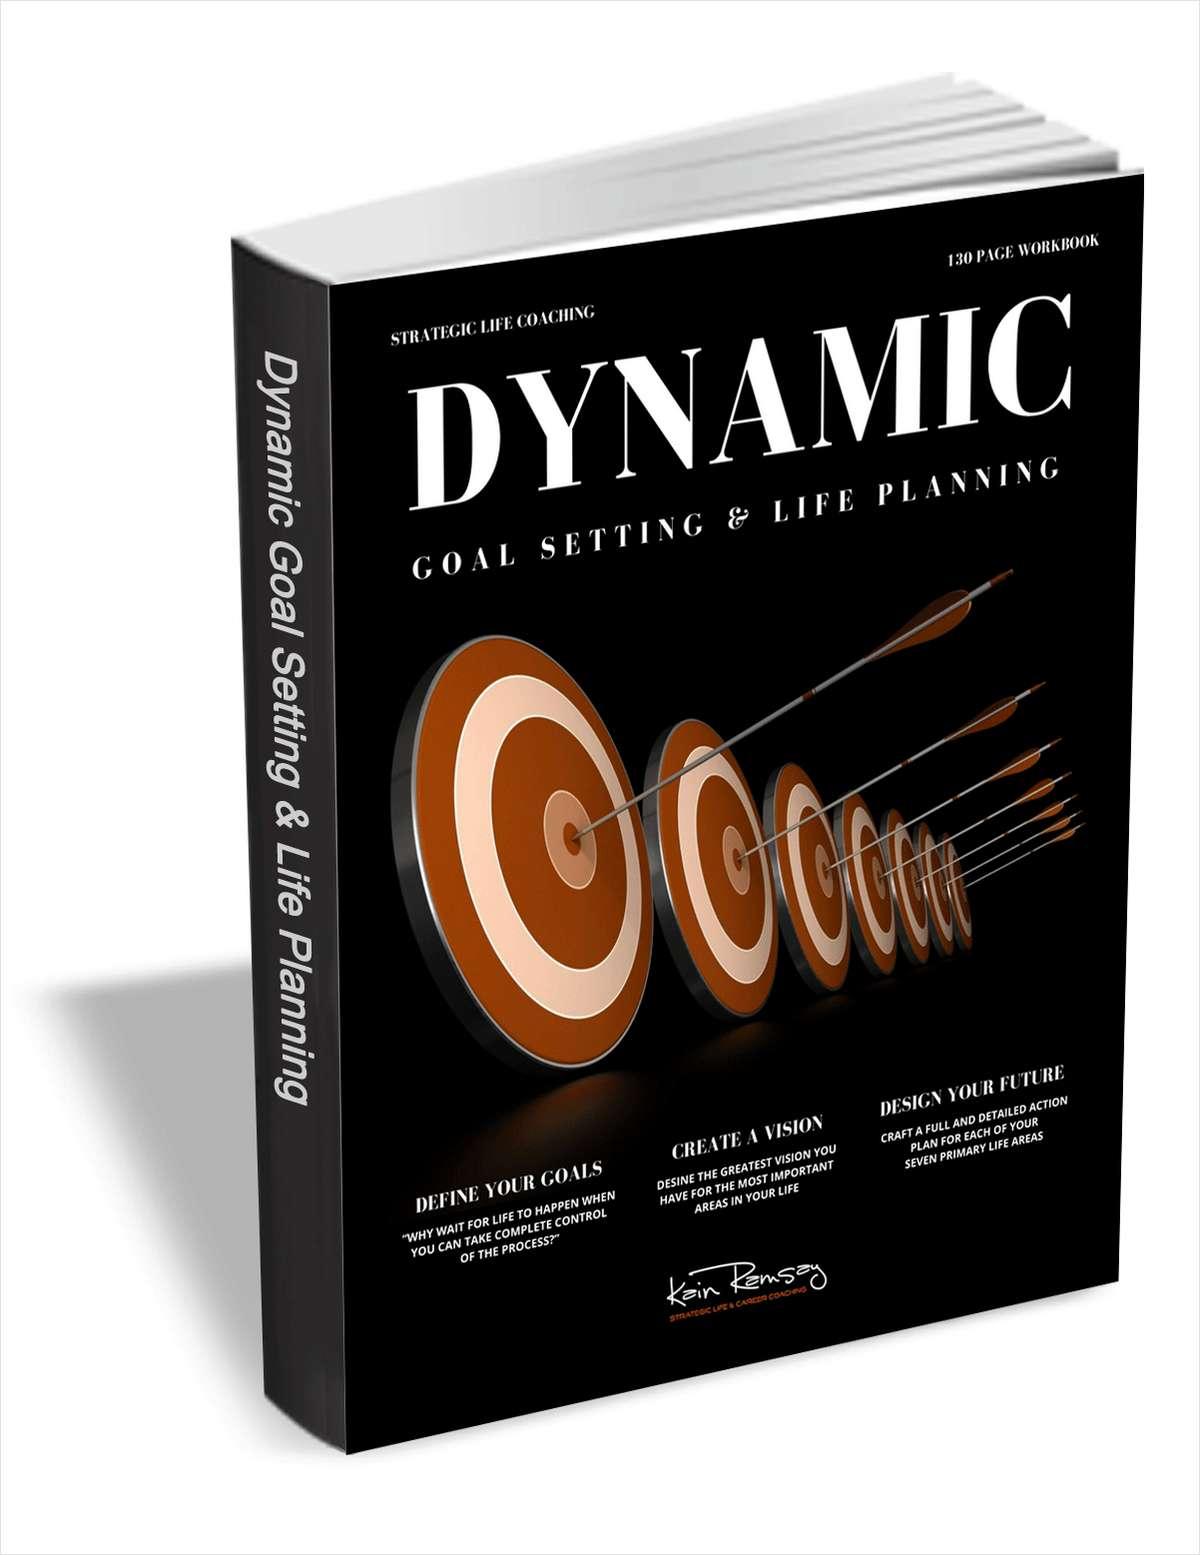 Dynamic Goal Setting & Life Planning